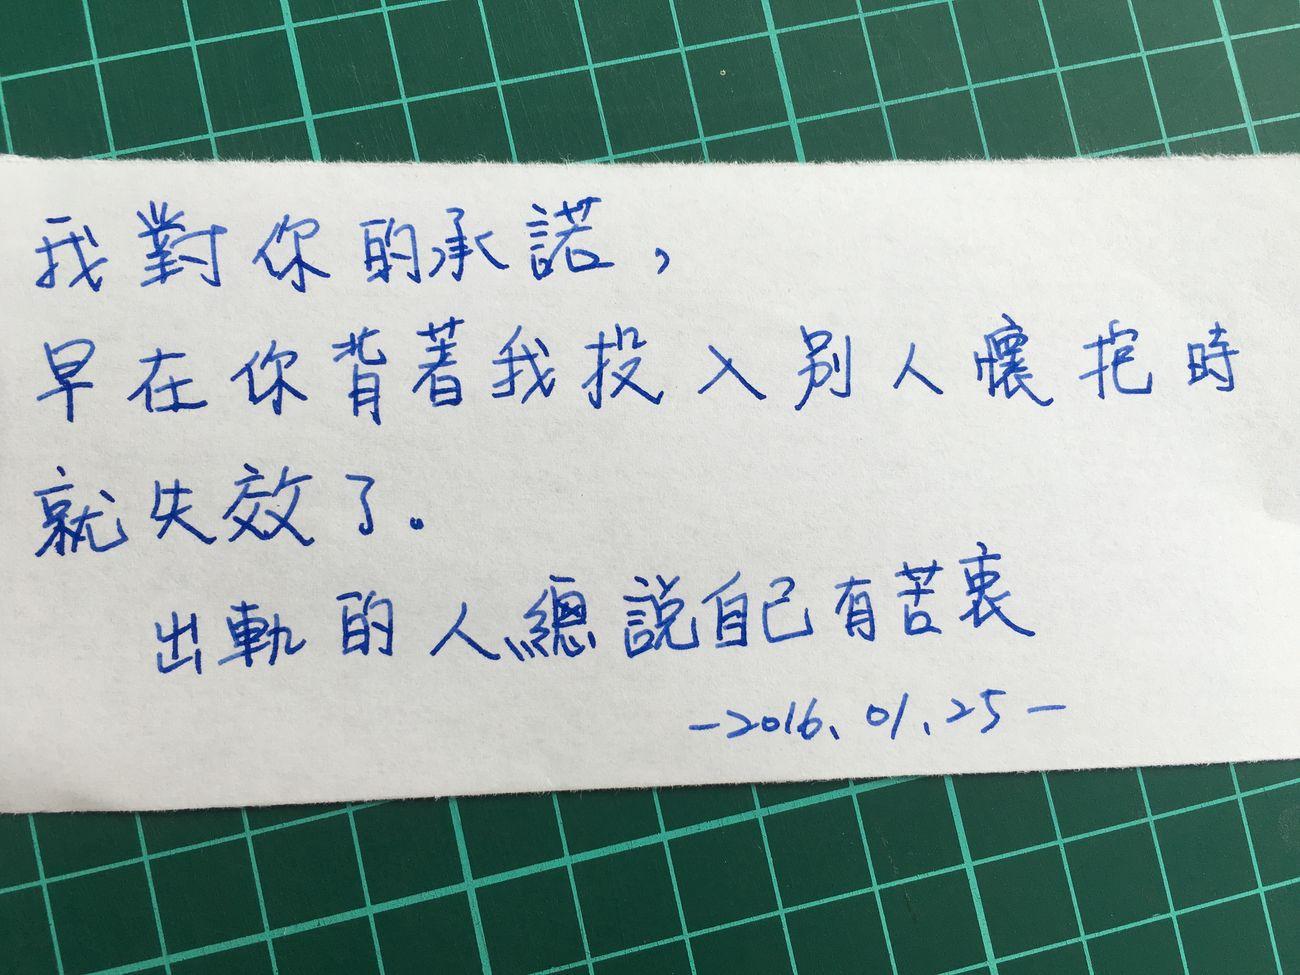 Lamy 前鎮區 January 文具 墨水 中文 一月 鋼筆 高雄 Taiwan 臺灣 Kaohsiung Taiwanese